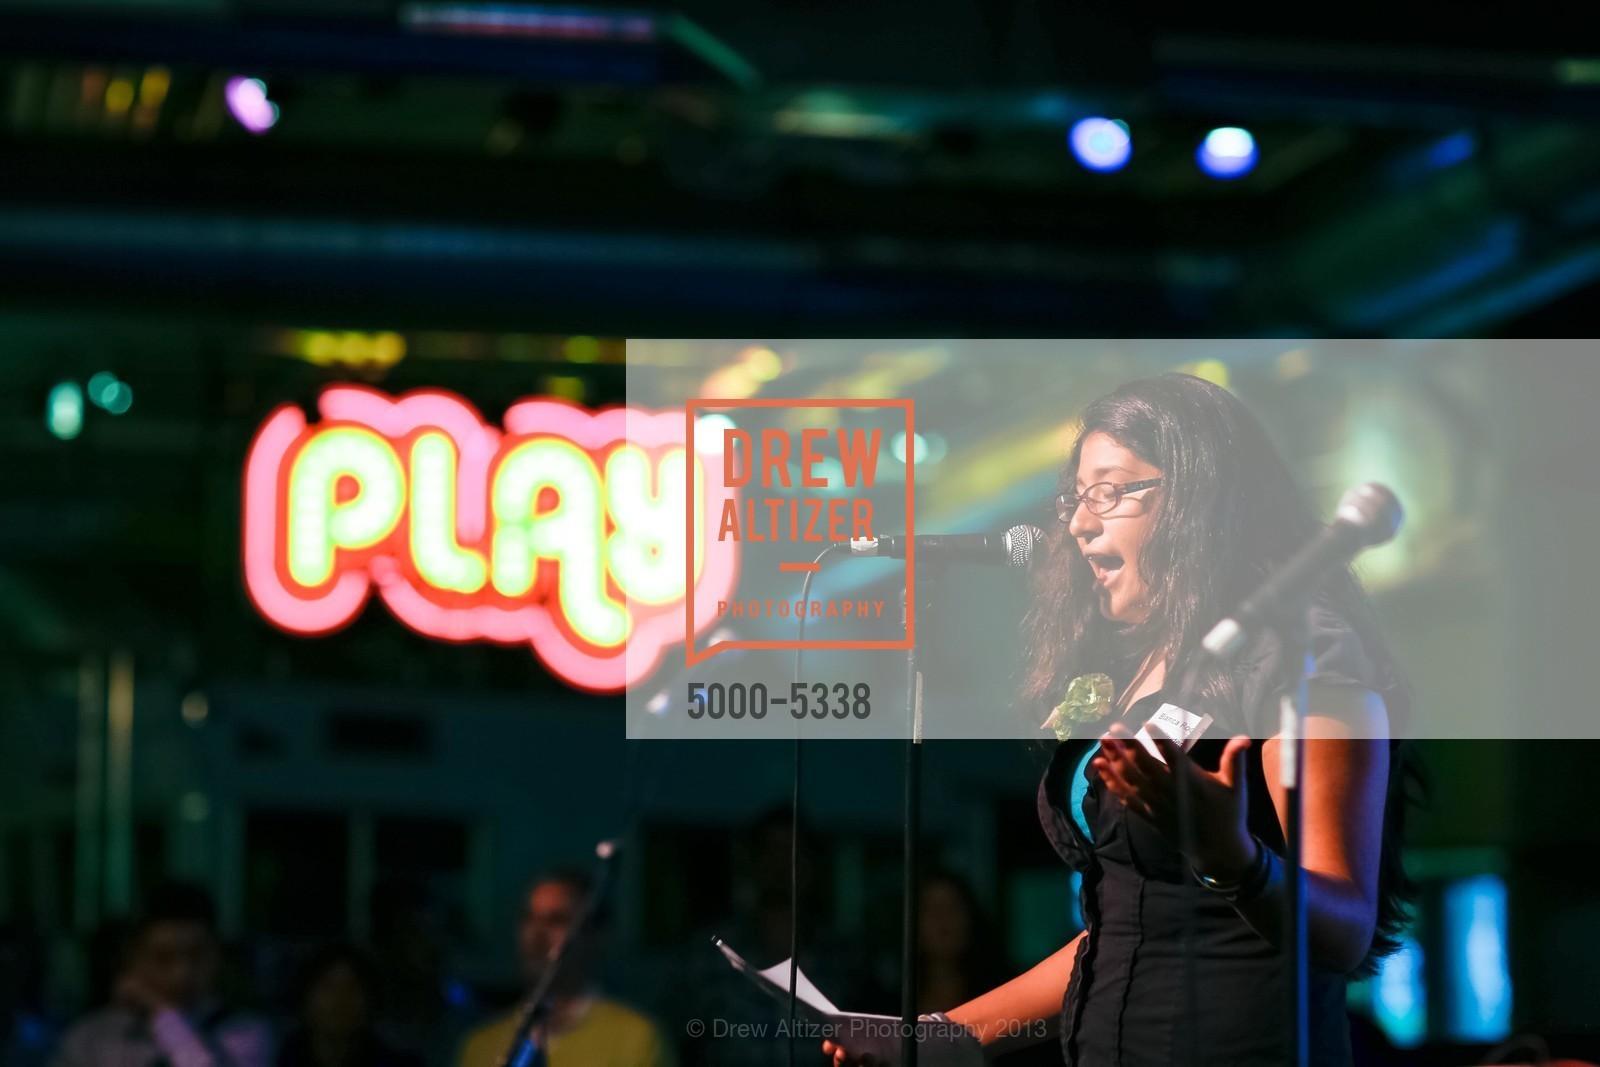 Bianca Rodriguez, Photo #5000-5338